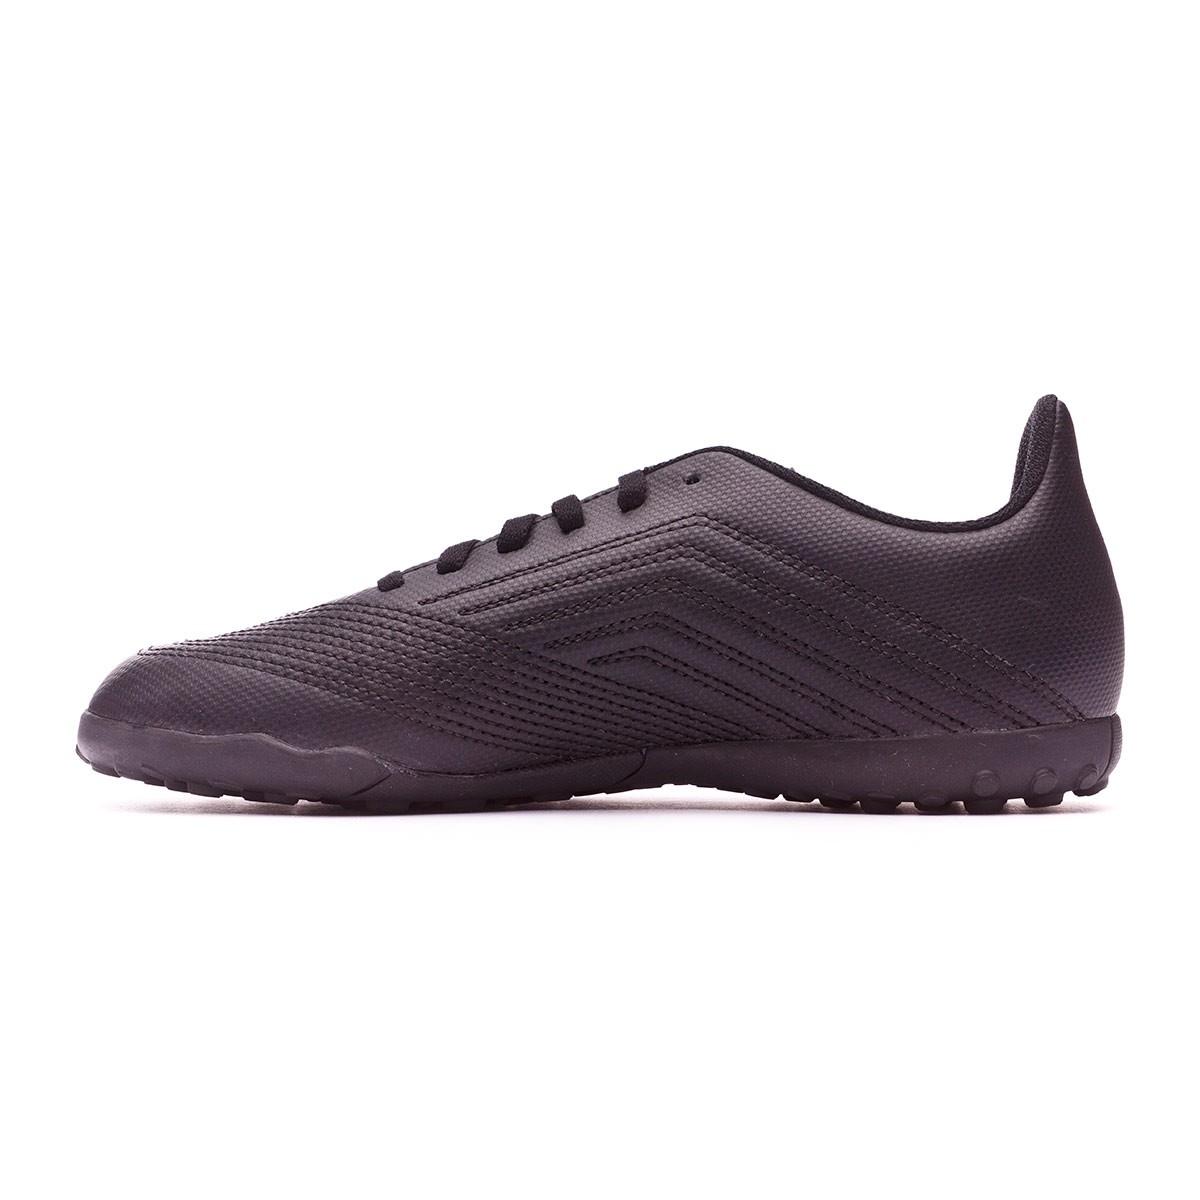 super popular 75814 381b4 Football Boot adidas Kids Predator Tango 18.4 Core black - Leaked soccer